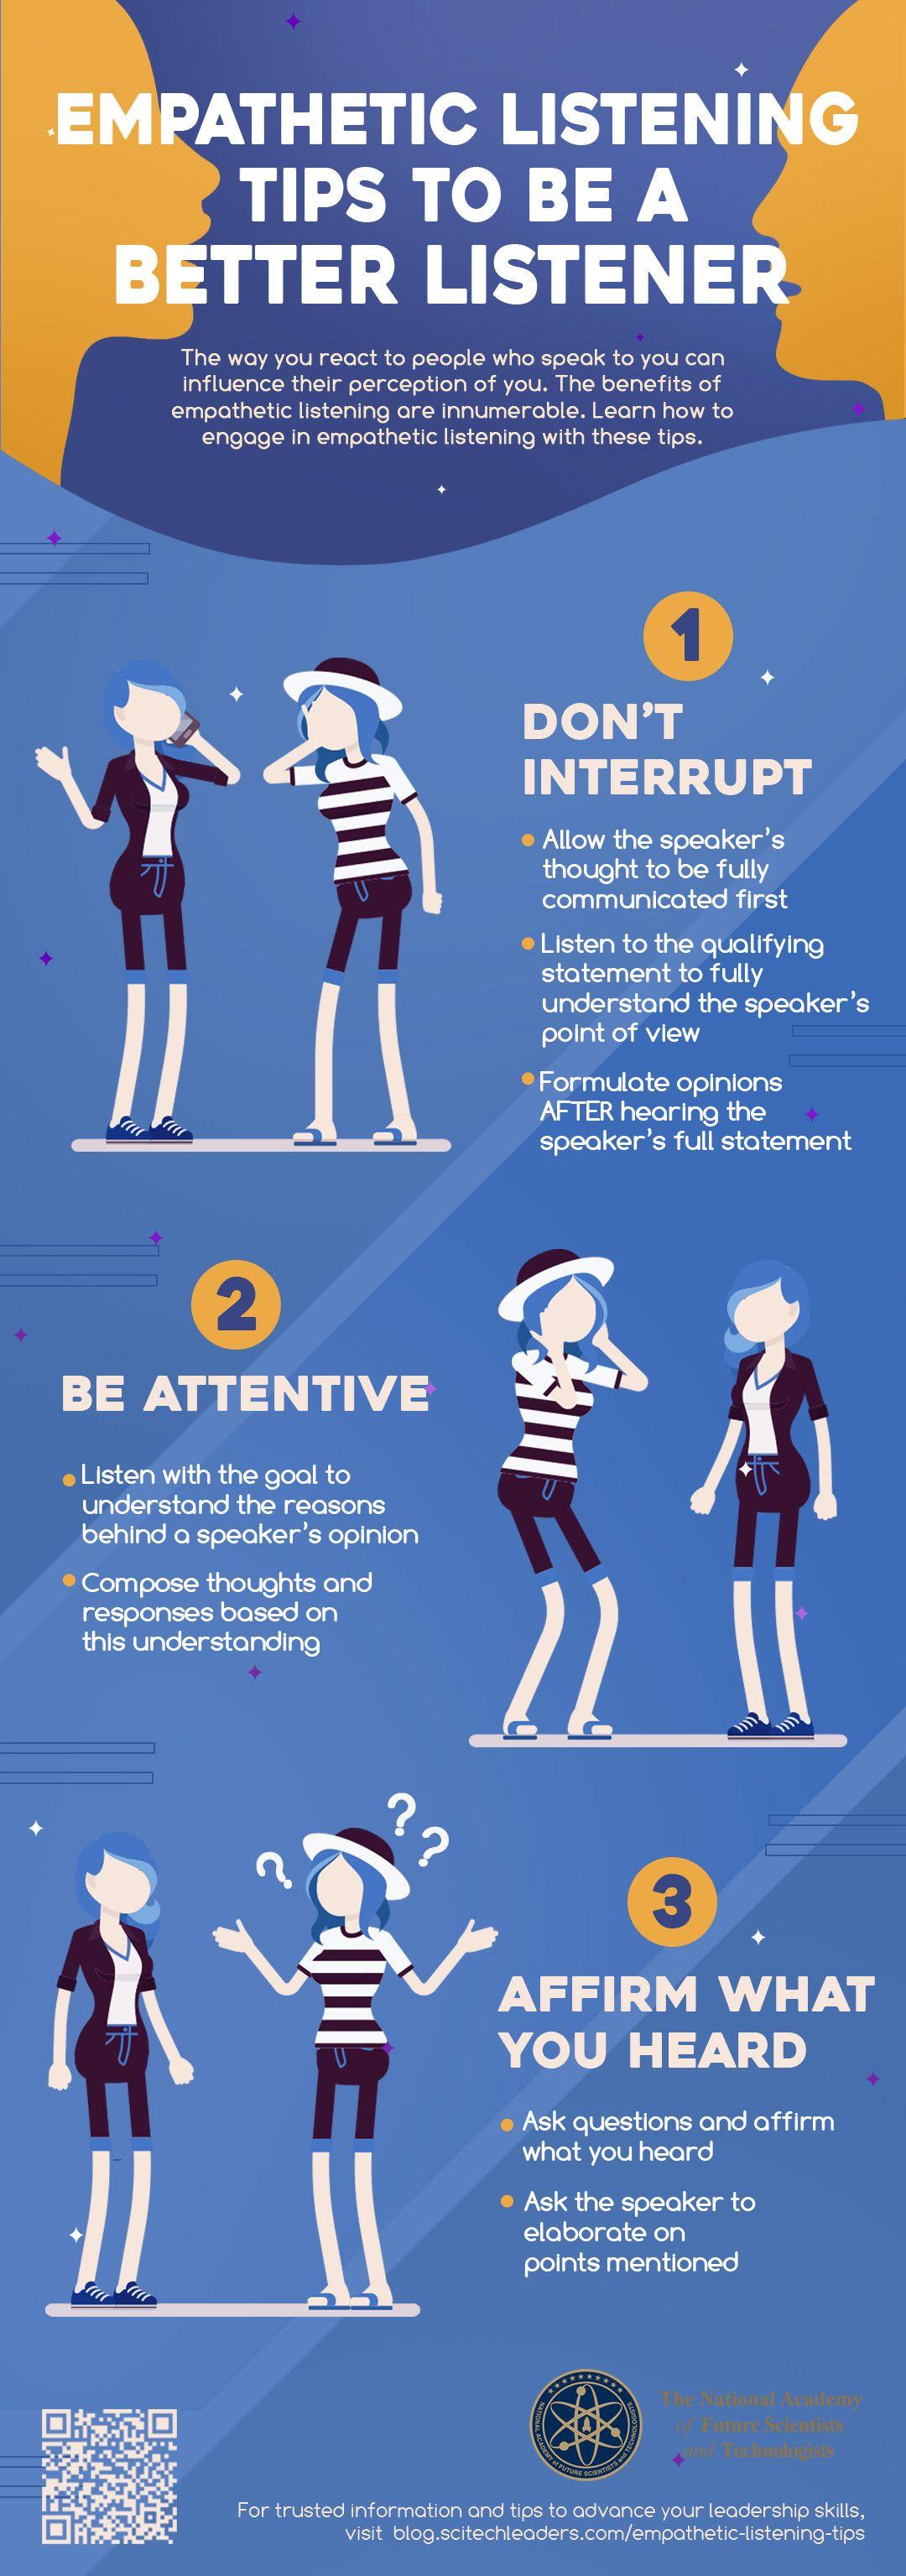 Empathetic Listening Tips To Be A Better Listener